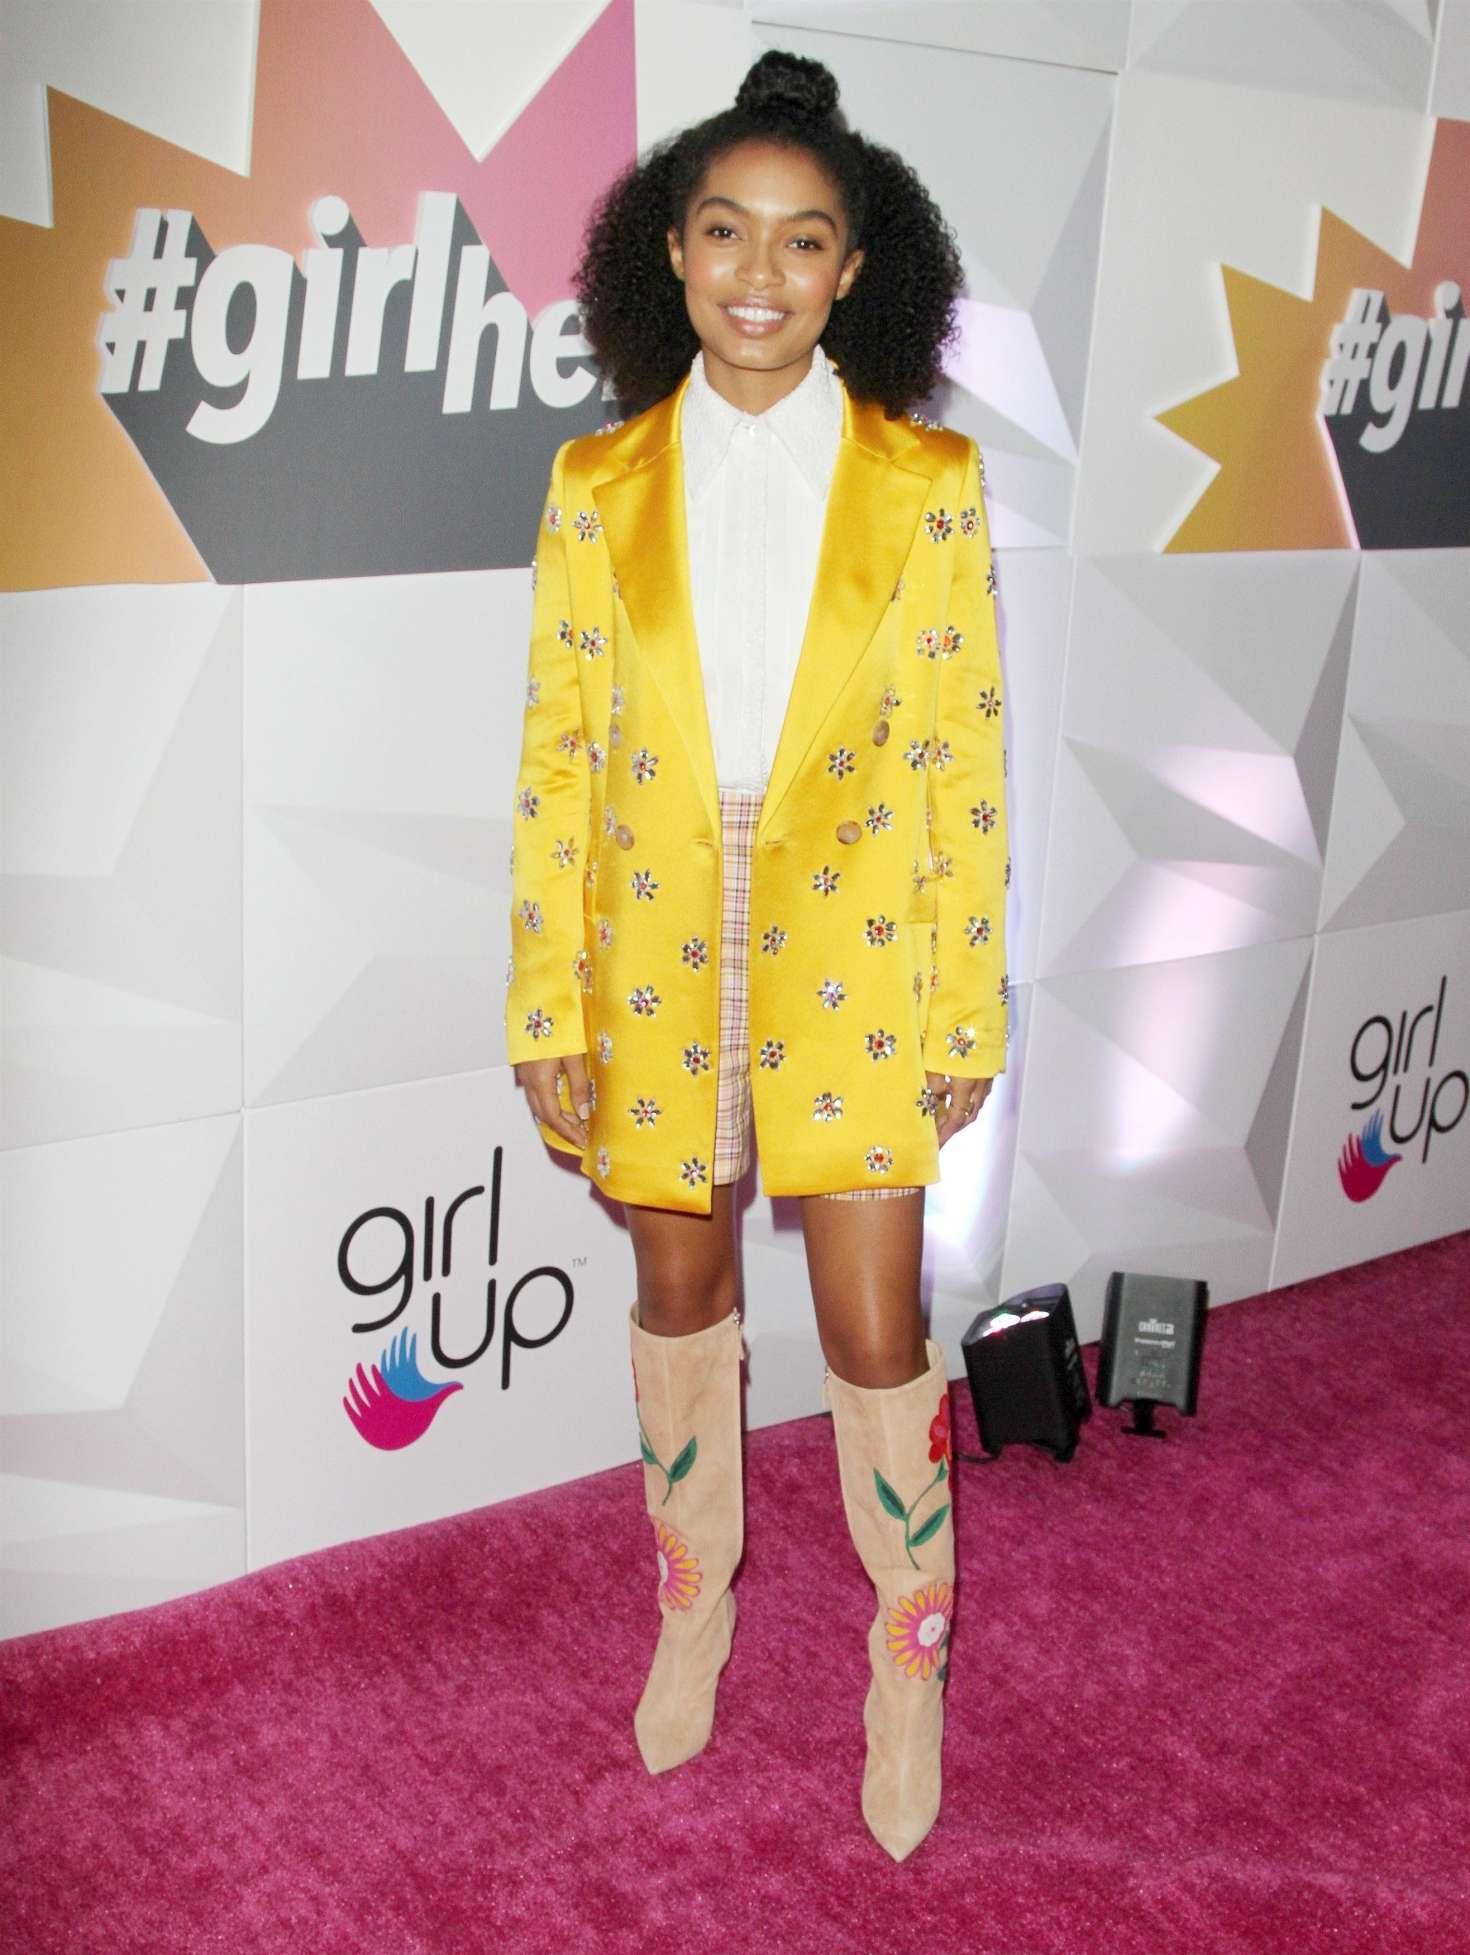 Yara Shahidi 2018 : Yara Shahidi: Girl Ups Inaugural GirlHero Awards Luncheon -03